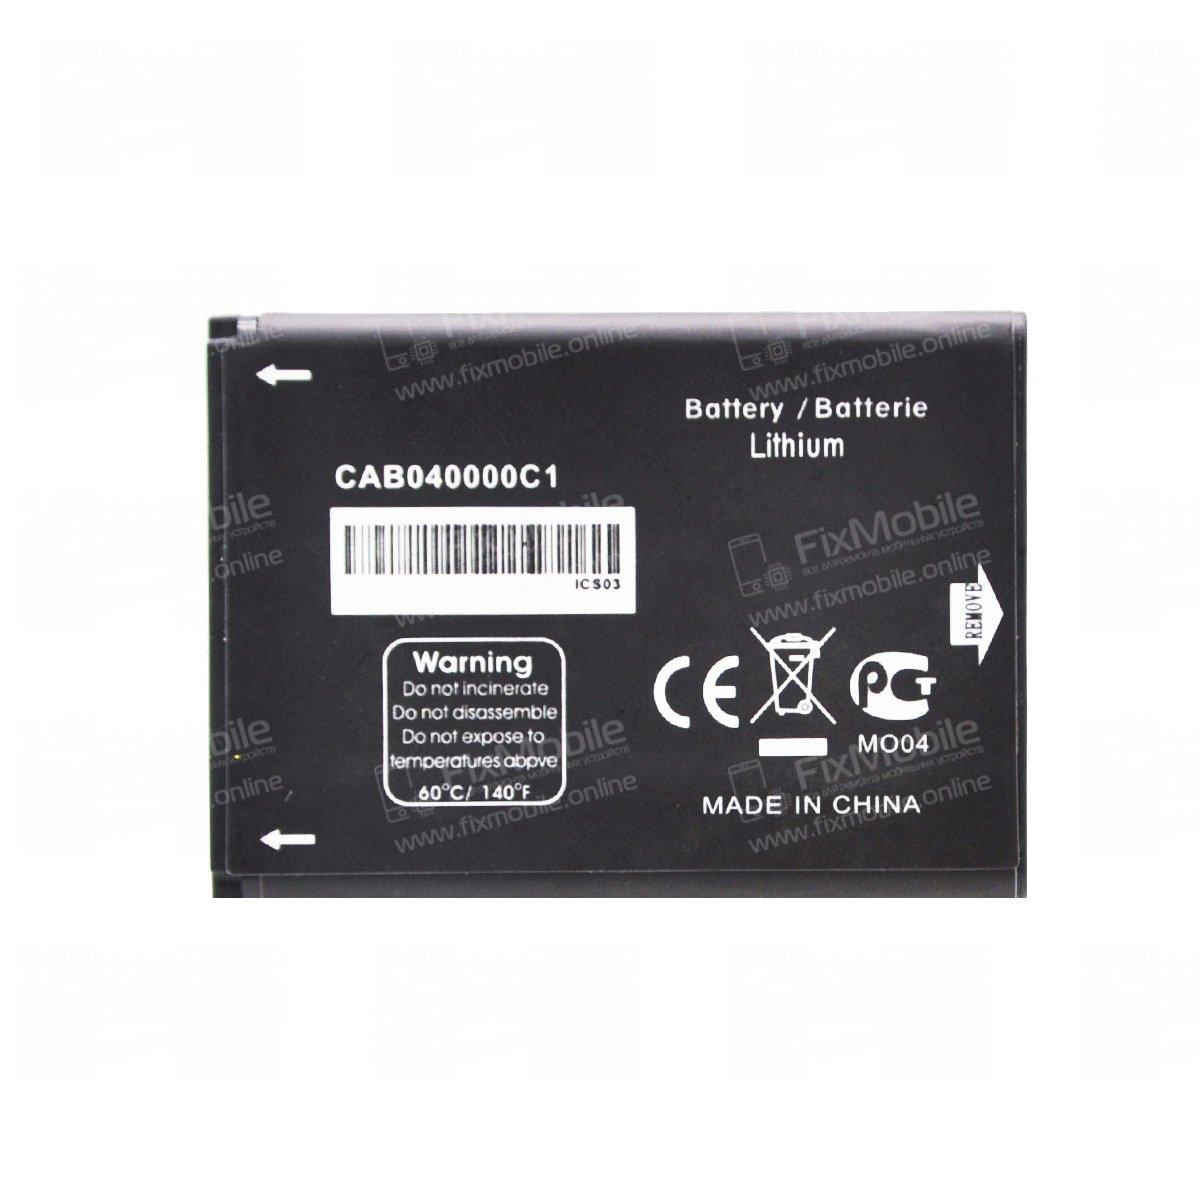 Аккумуляторная батарея для Alcatel One Touch 1016D CAB0400000C1